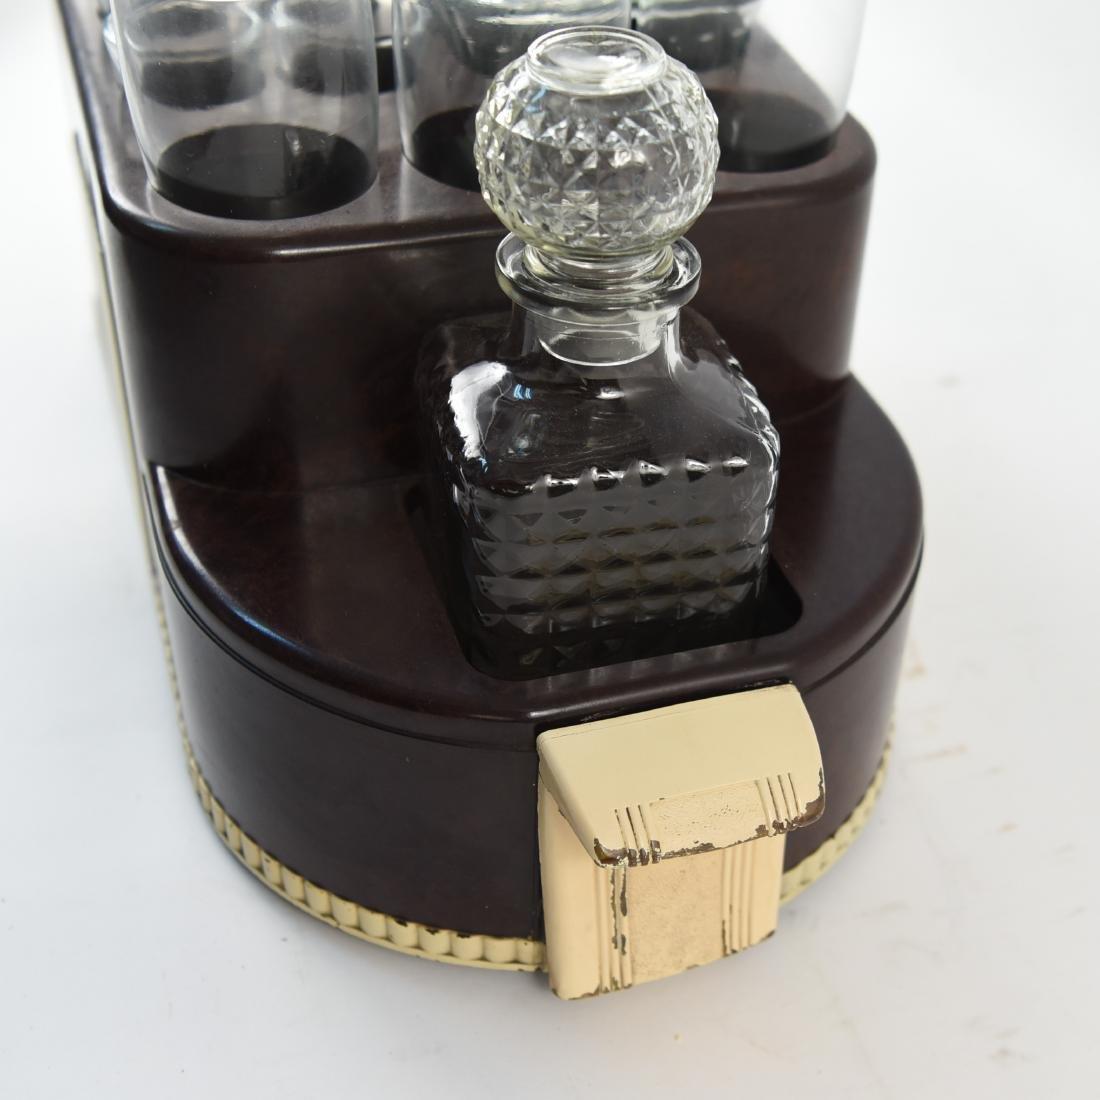 VINTAGE ART DECO LIQUOR DECANTER DRINK CADDY - 6